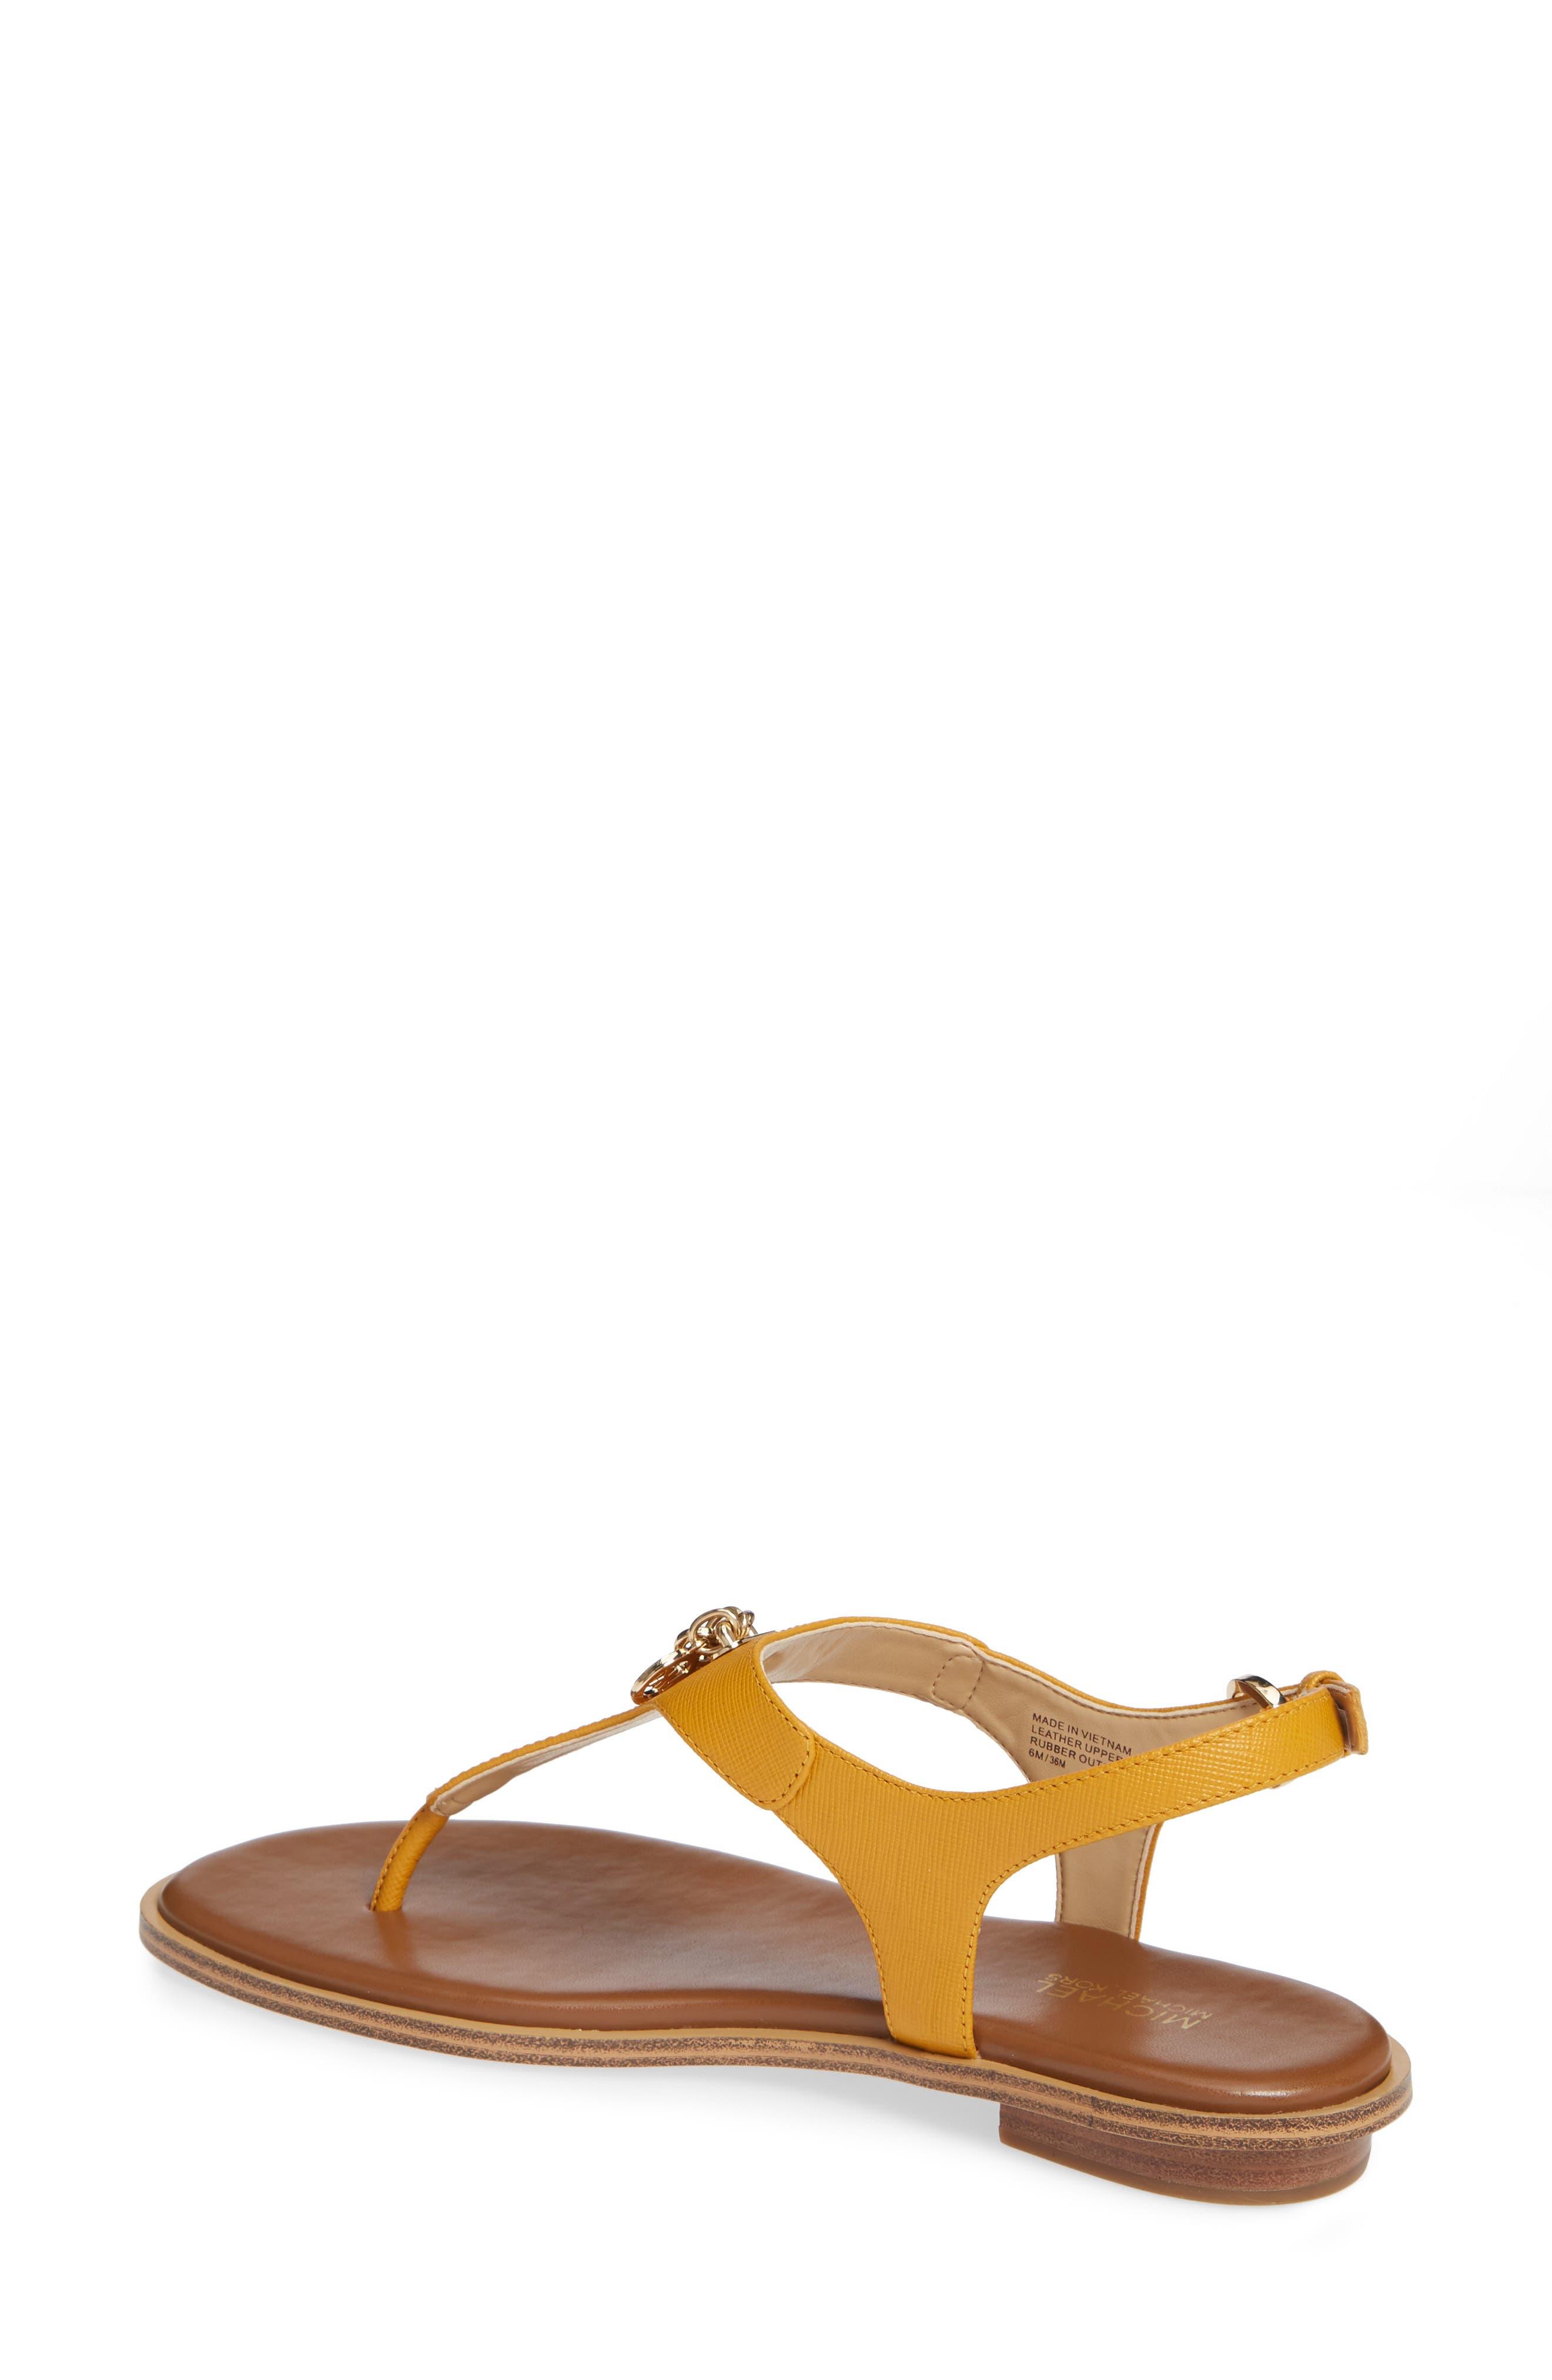 Suki T-Strap Charm Sandal,                             Alternate thumbnail 2, color,                             MARIGOLD LEATHER